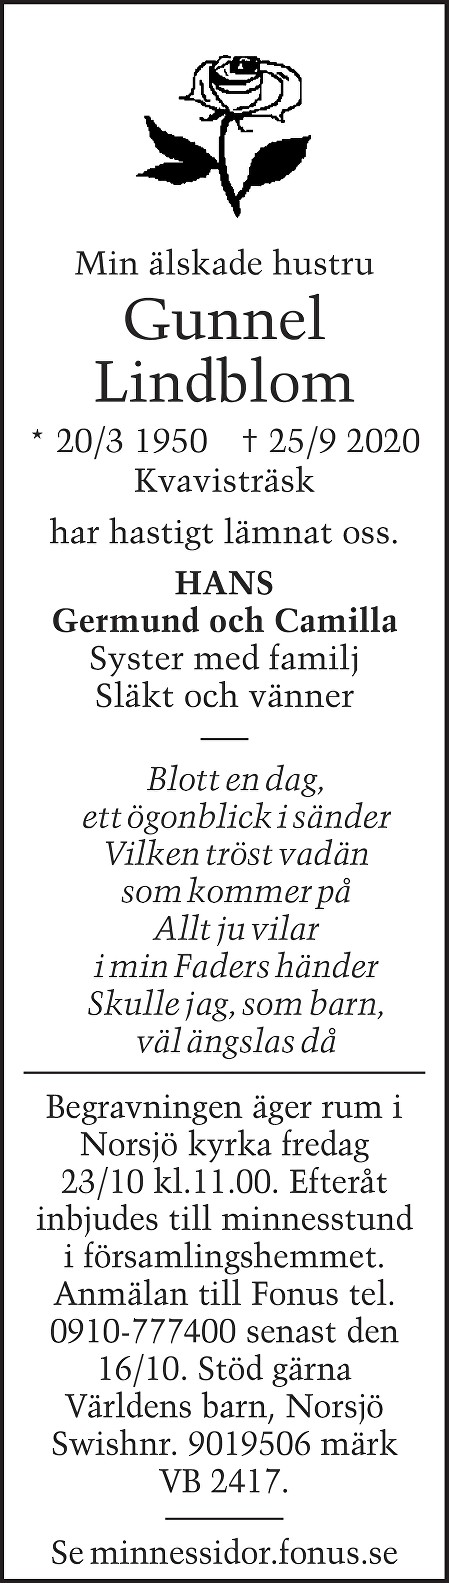 Gunnel Lindblom Death notice